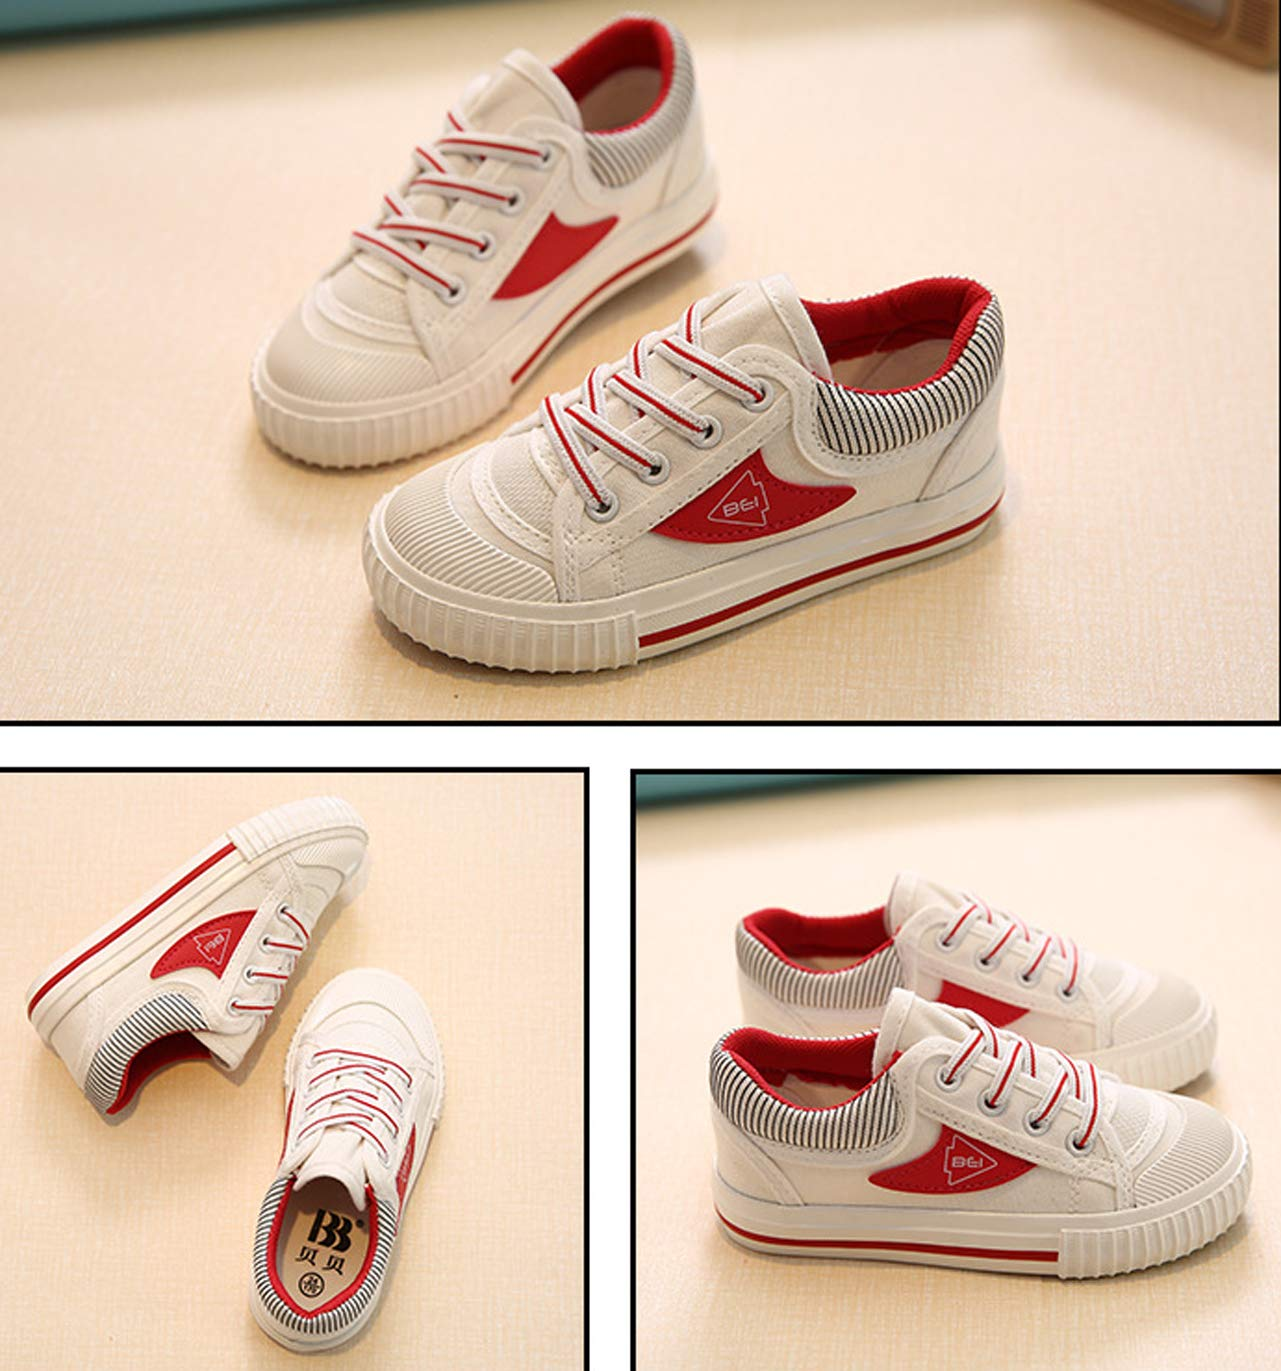 iDuoDuo Boys Girls Fashion Stripes Lace up Anti Slip School Tennis Shoes Red 9.5 M US Toddler by iDuoDuo (Image #4)